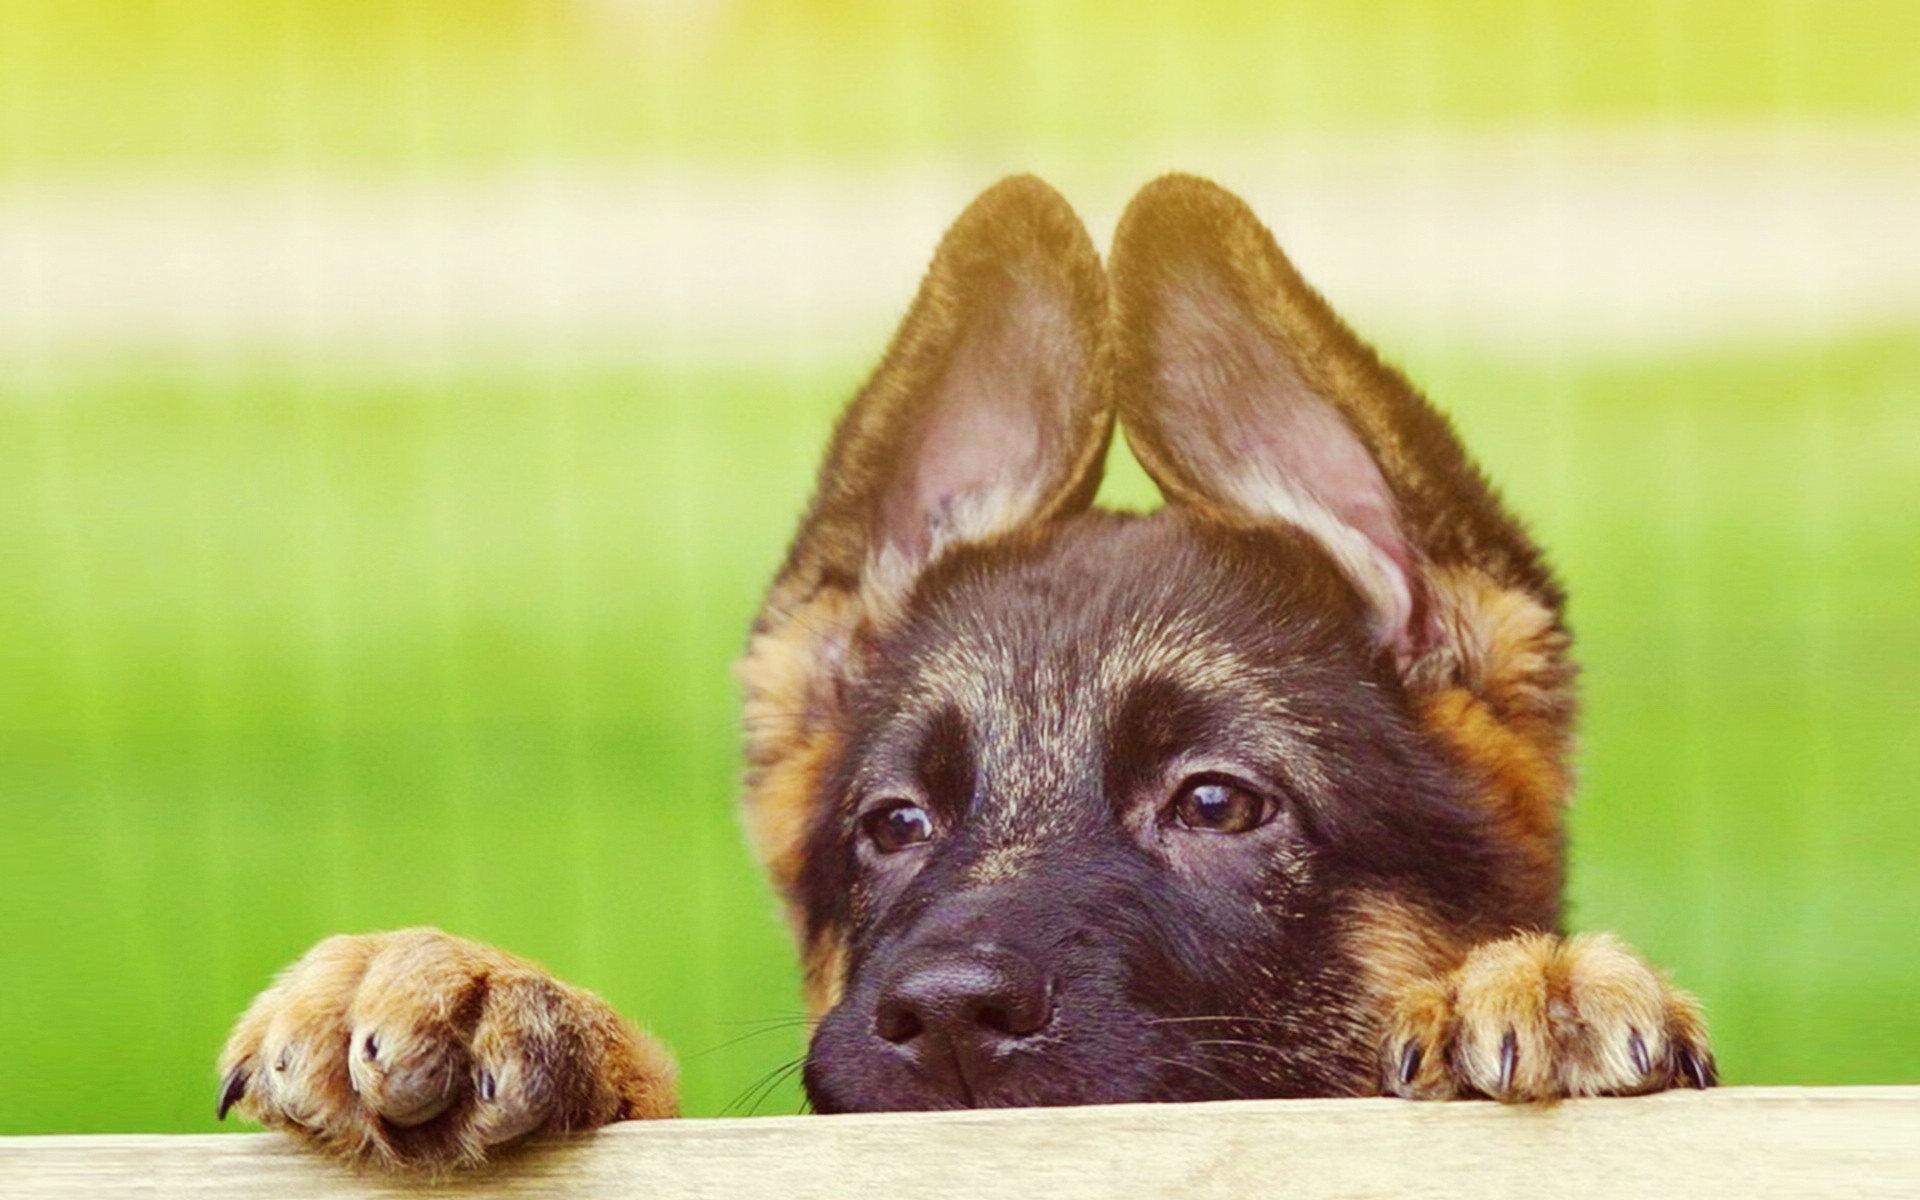 download Cute German Shepherd Puppies Wallpaper High 1920x1200